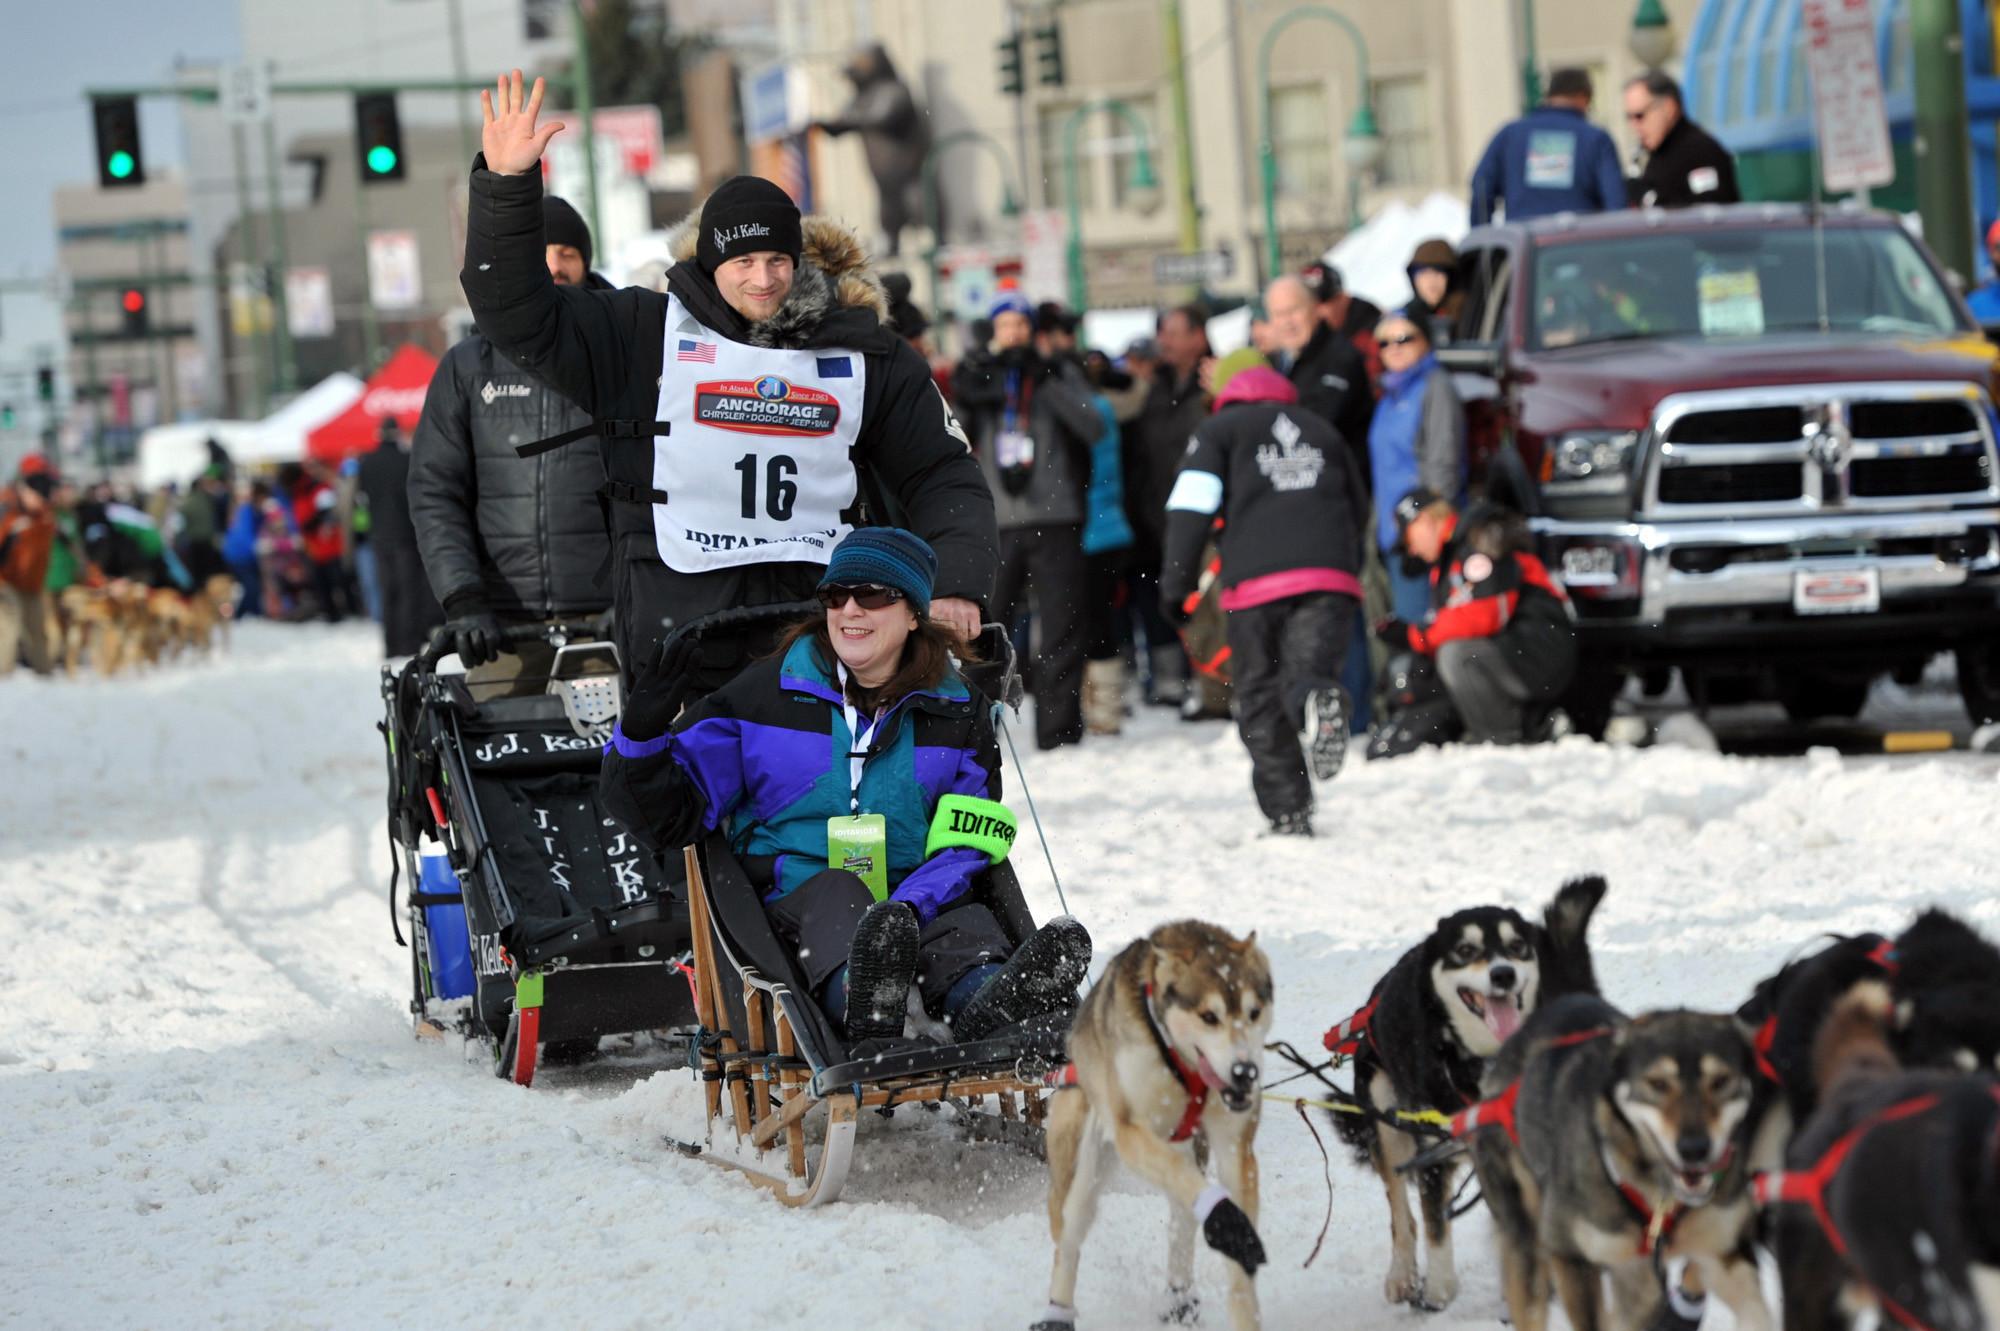 Mushers set off from Alaska town as Iditarod race begins ...